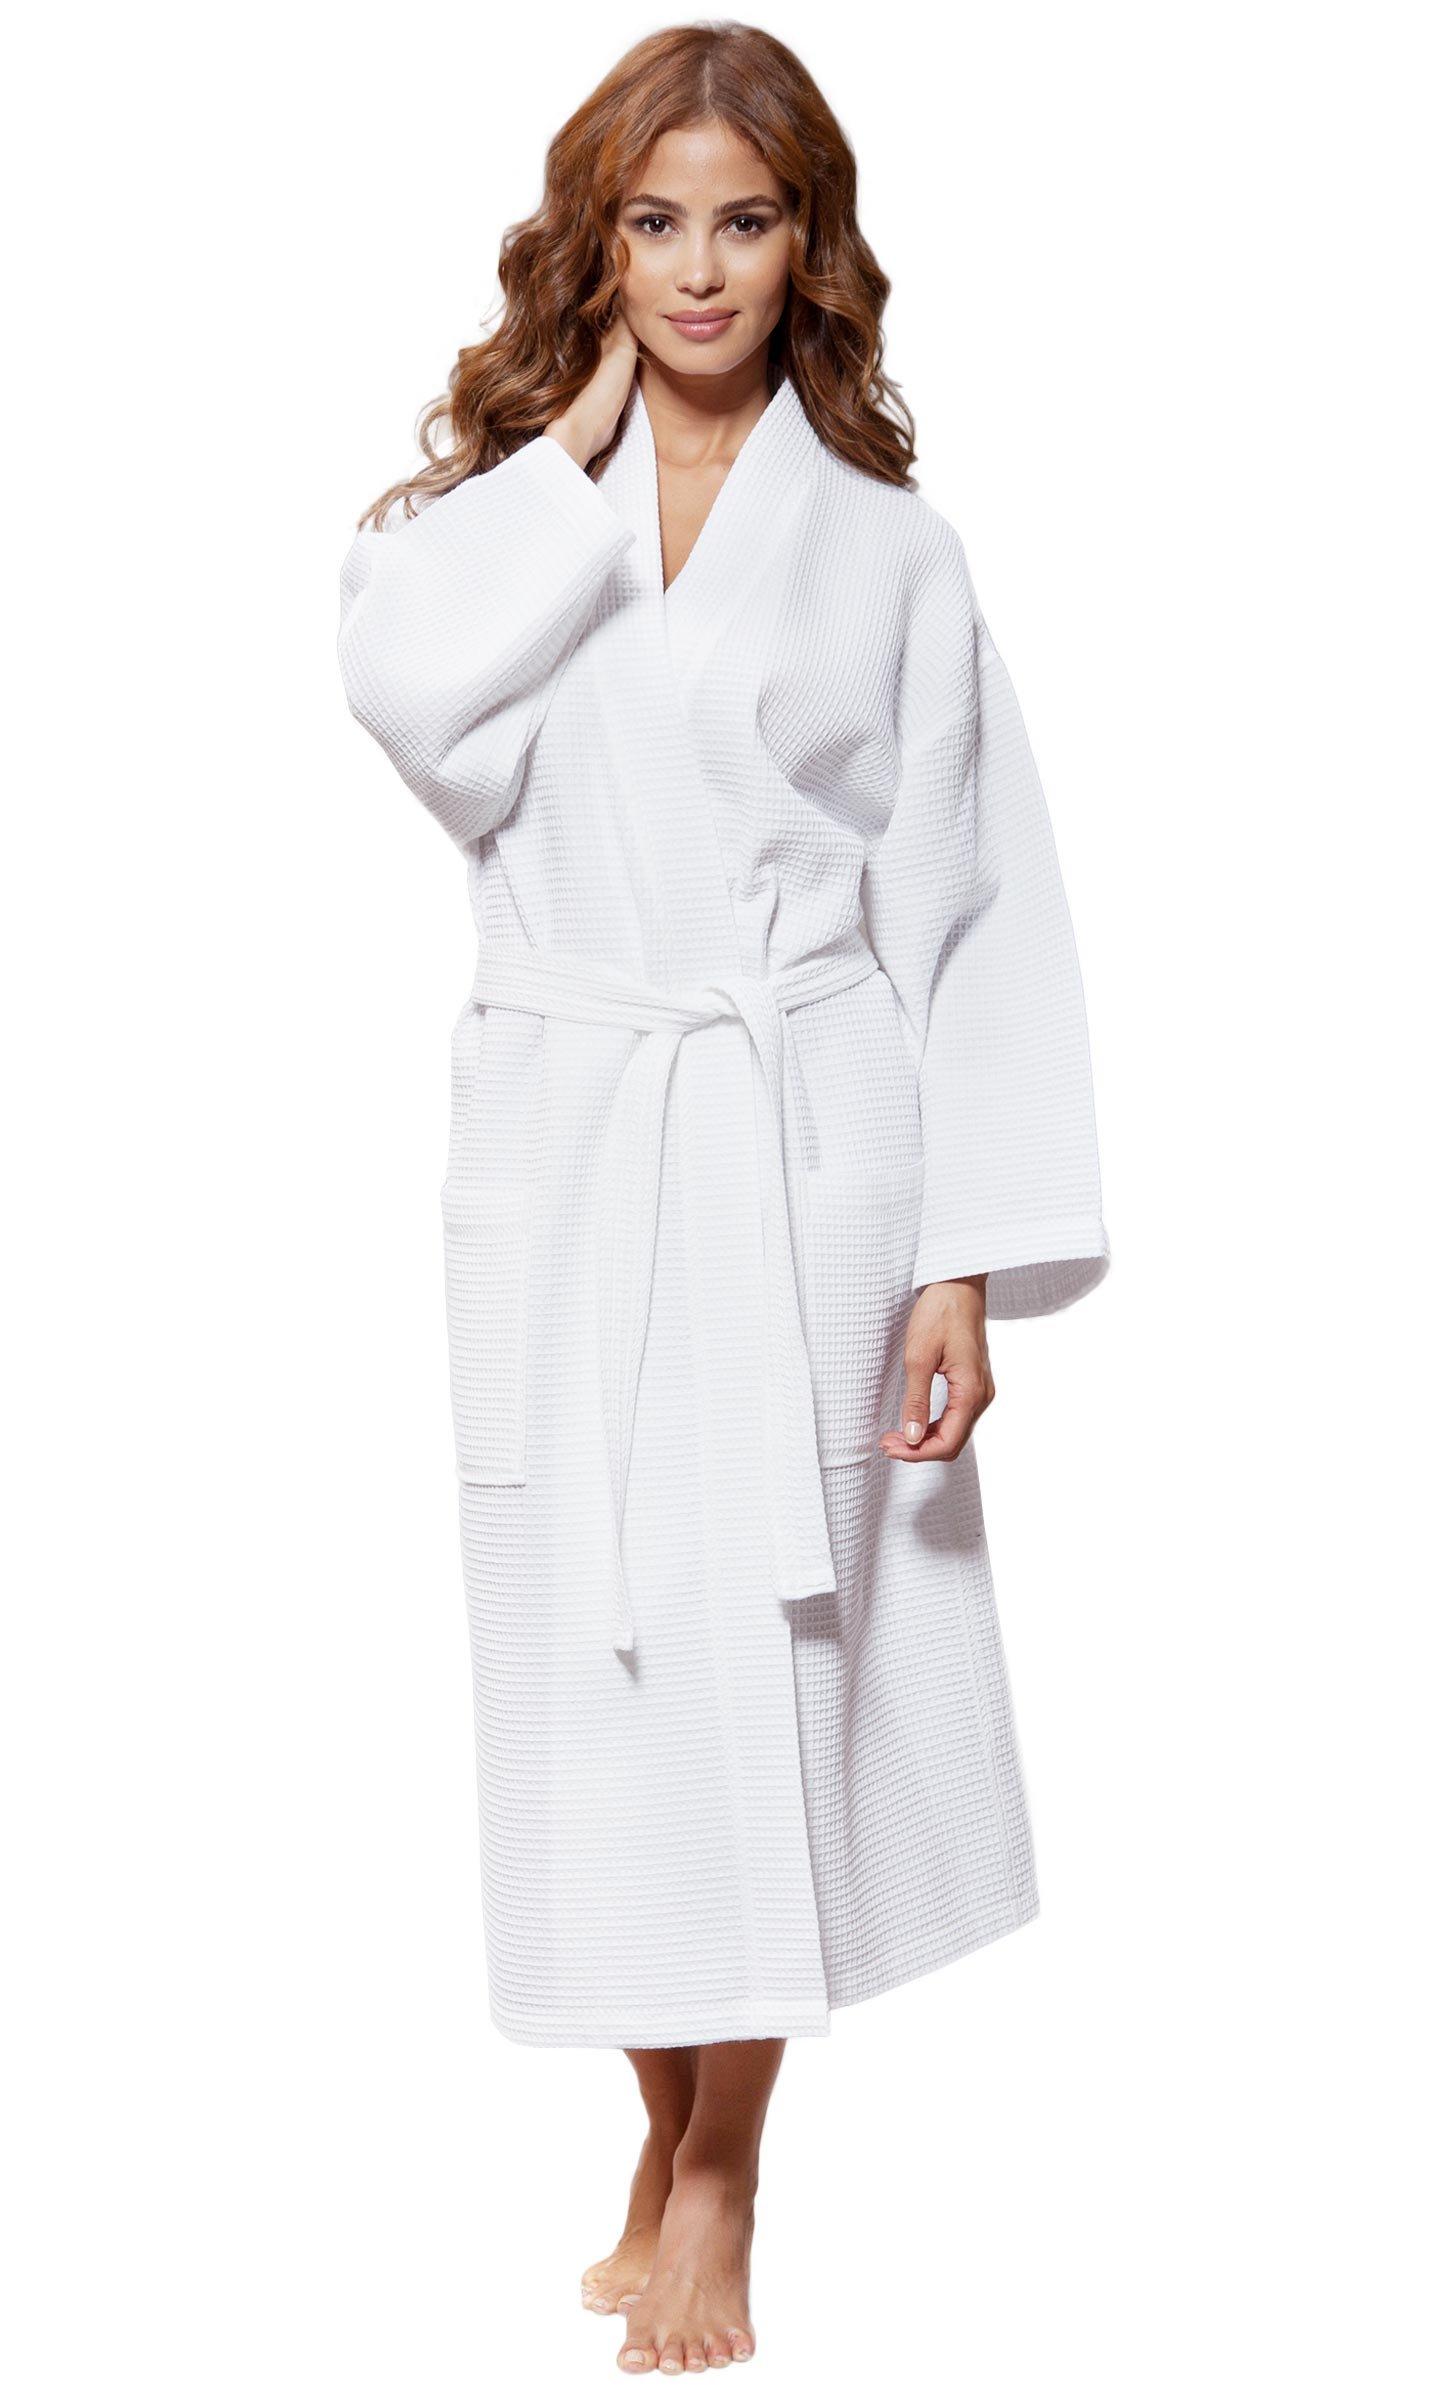 Turquaz Linen Lightweight Long Waffle Kimono Unisex Spa Robe (One Size, White)